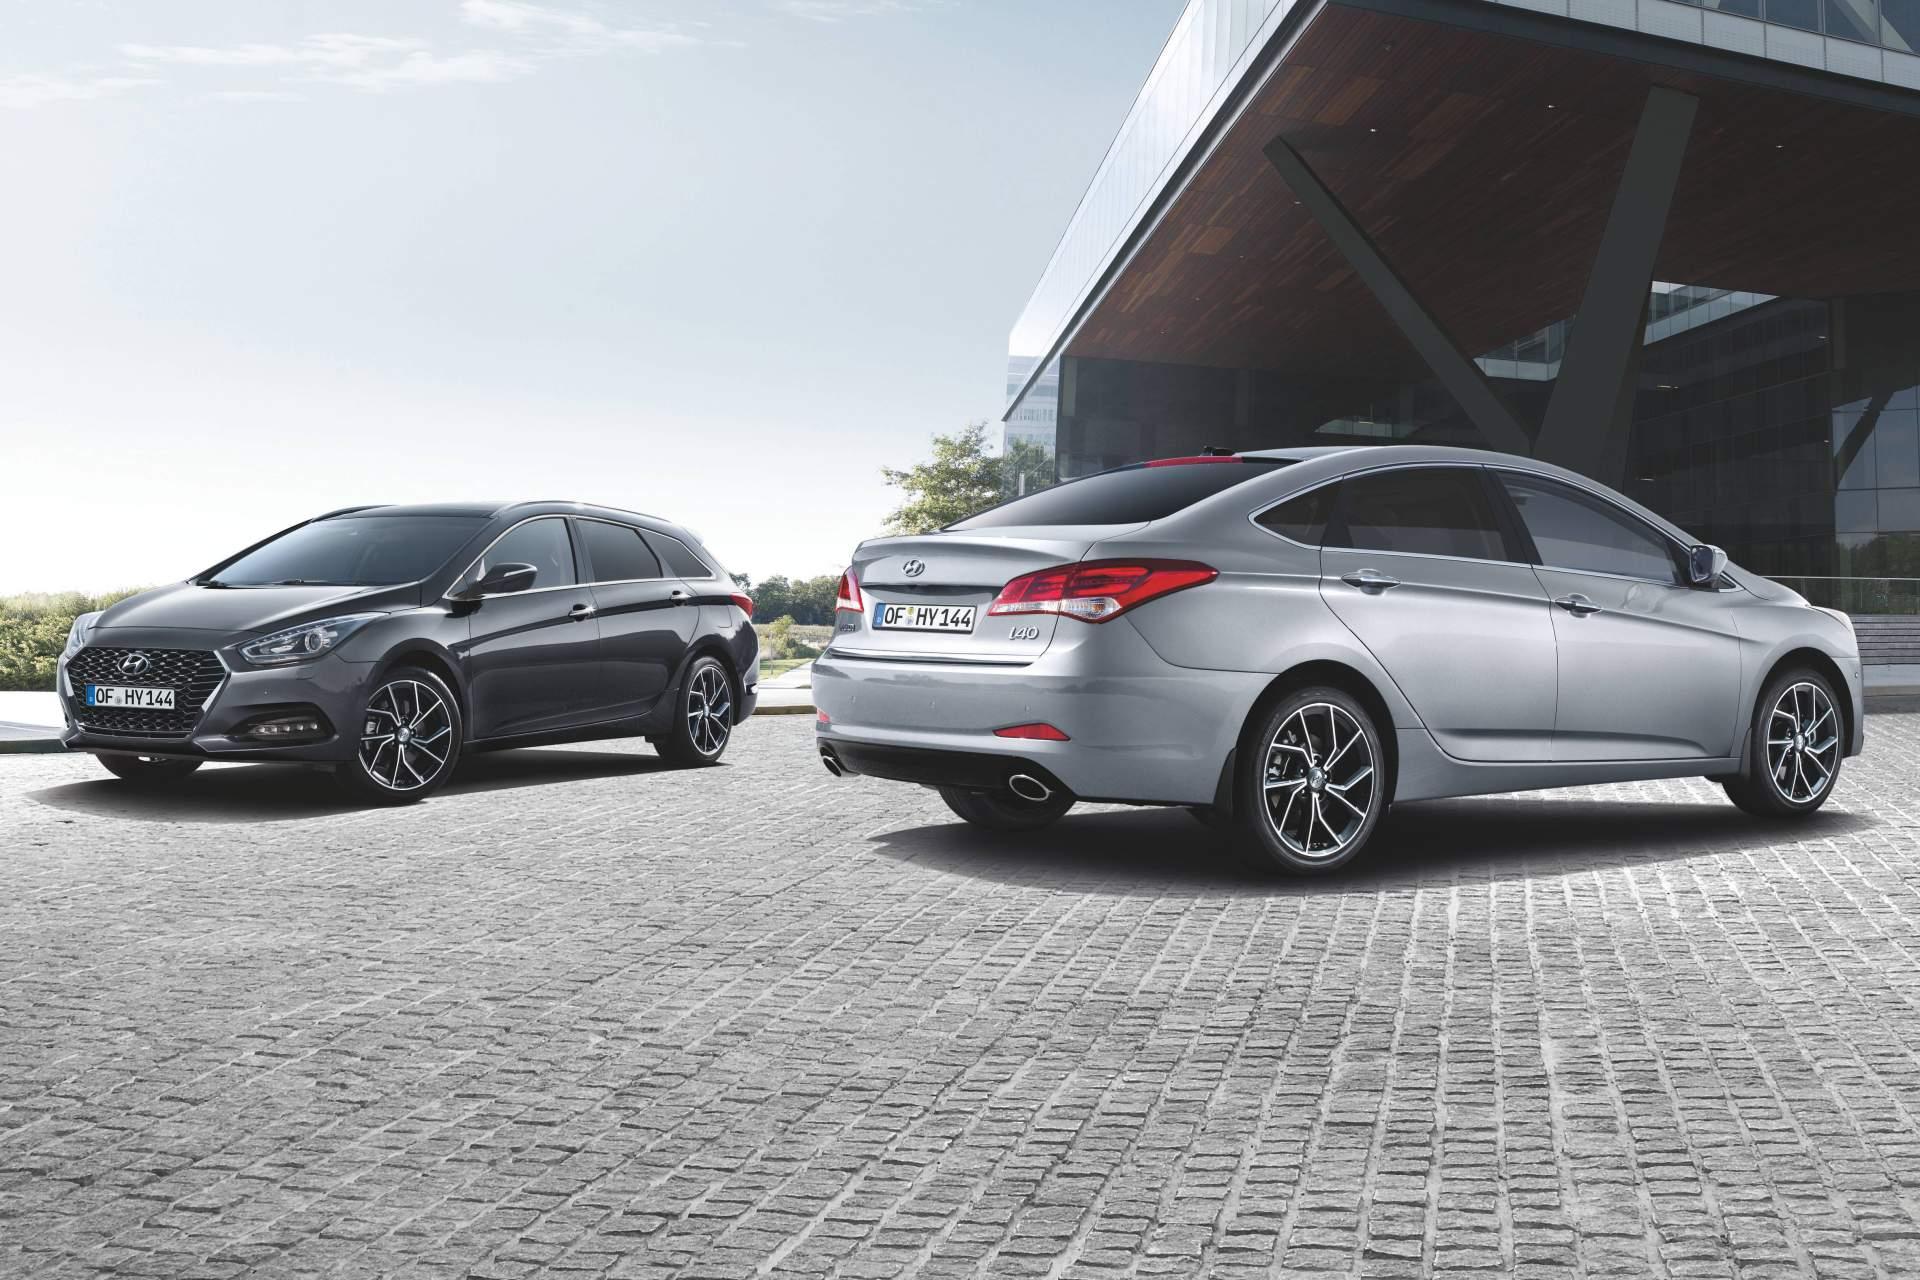 2019_Hyundai_i40_facelift–01